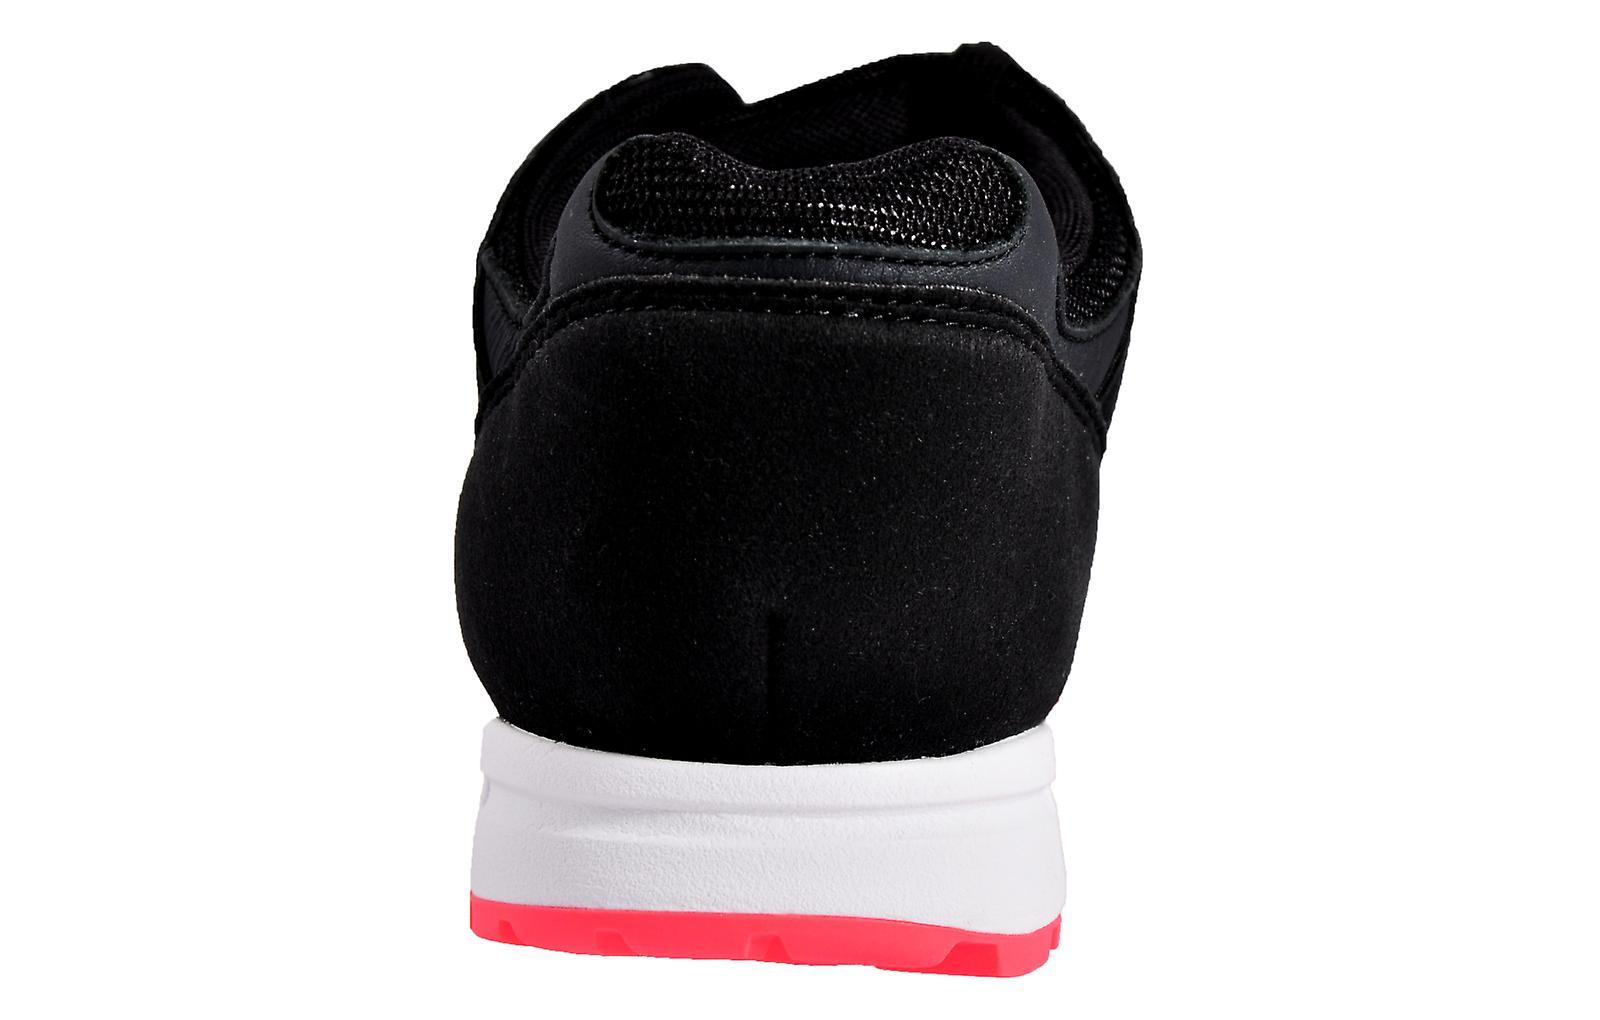 Adidas Originals Equipment Racing 91 Black / White / Pink Red